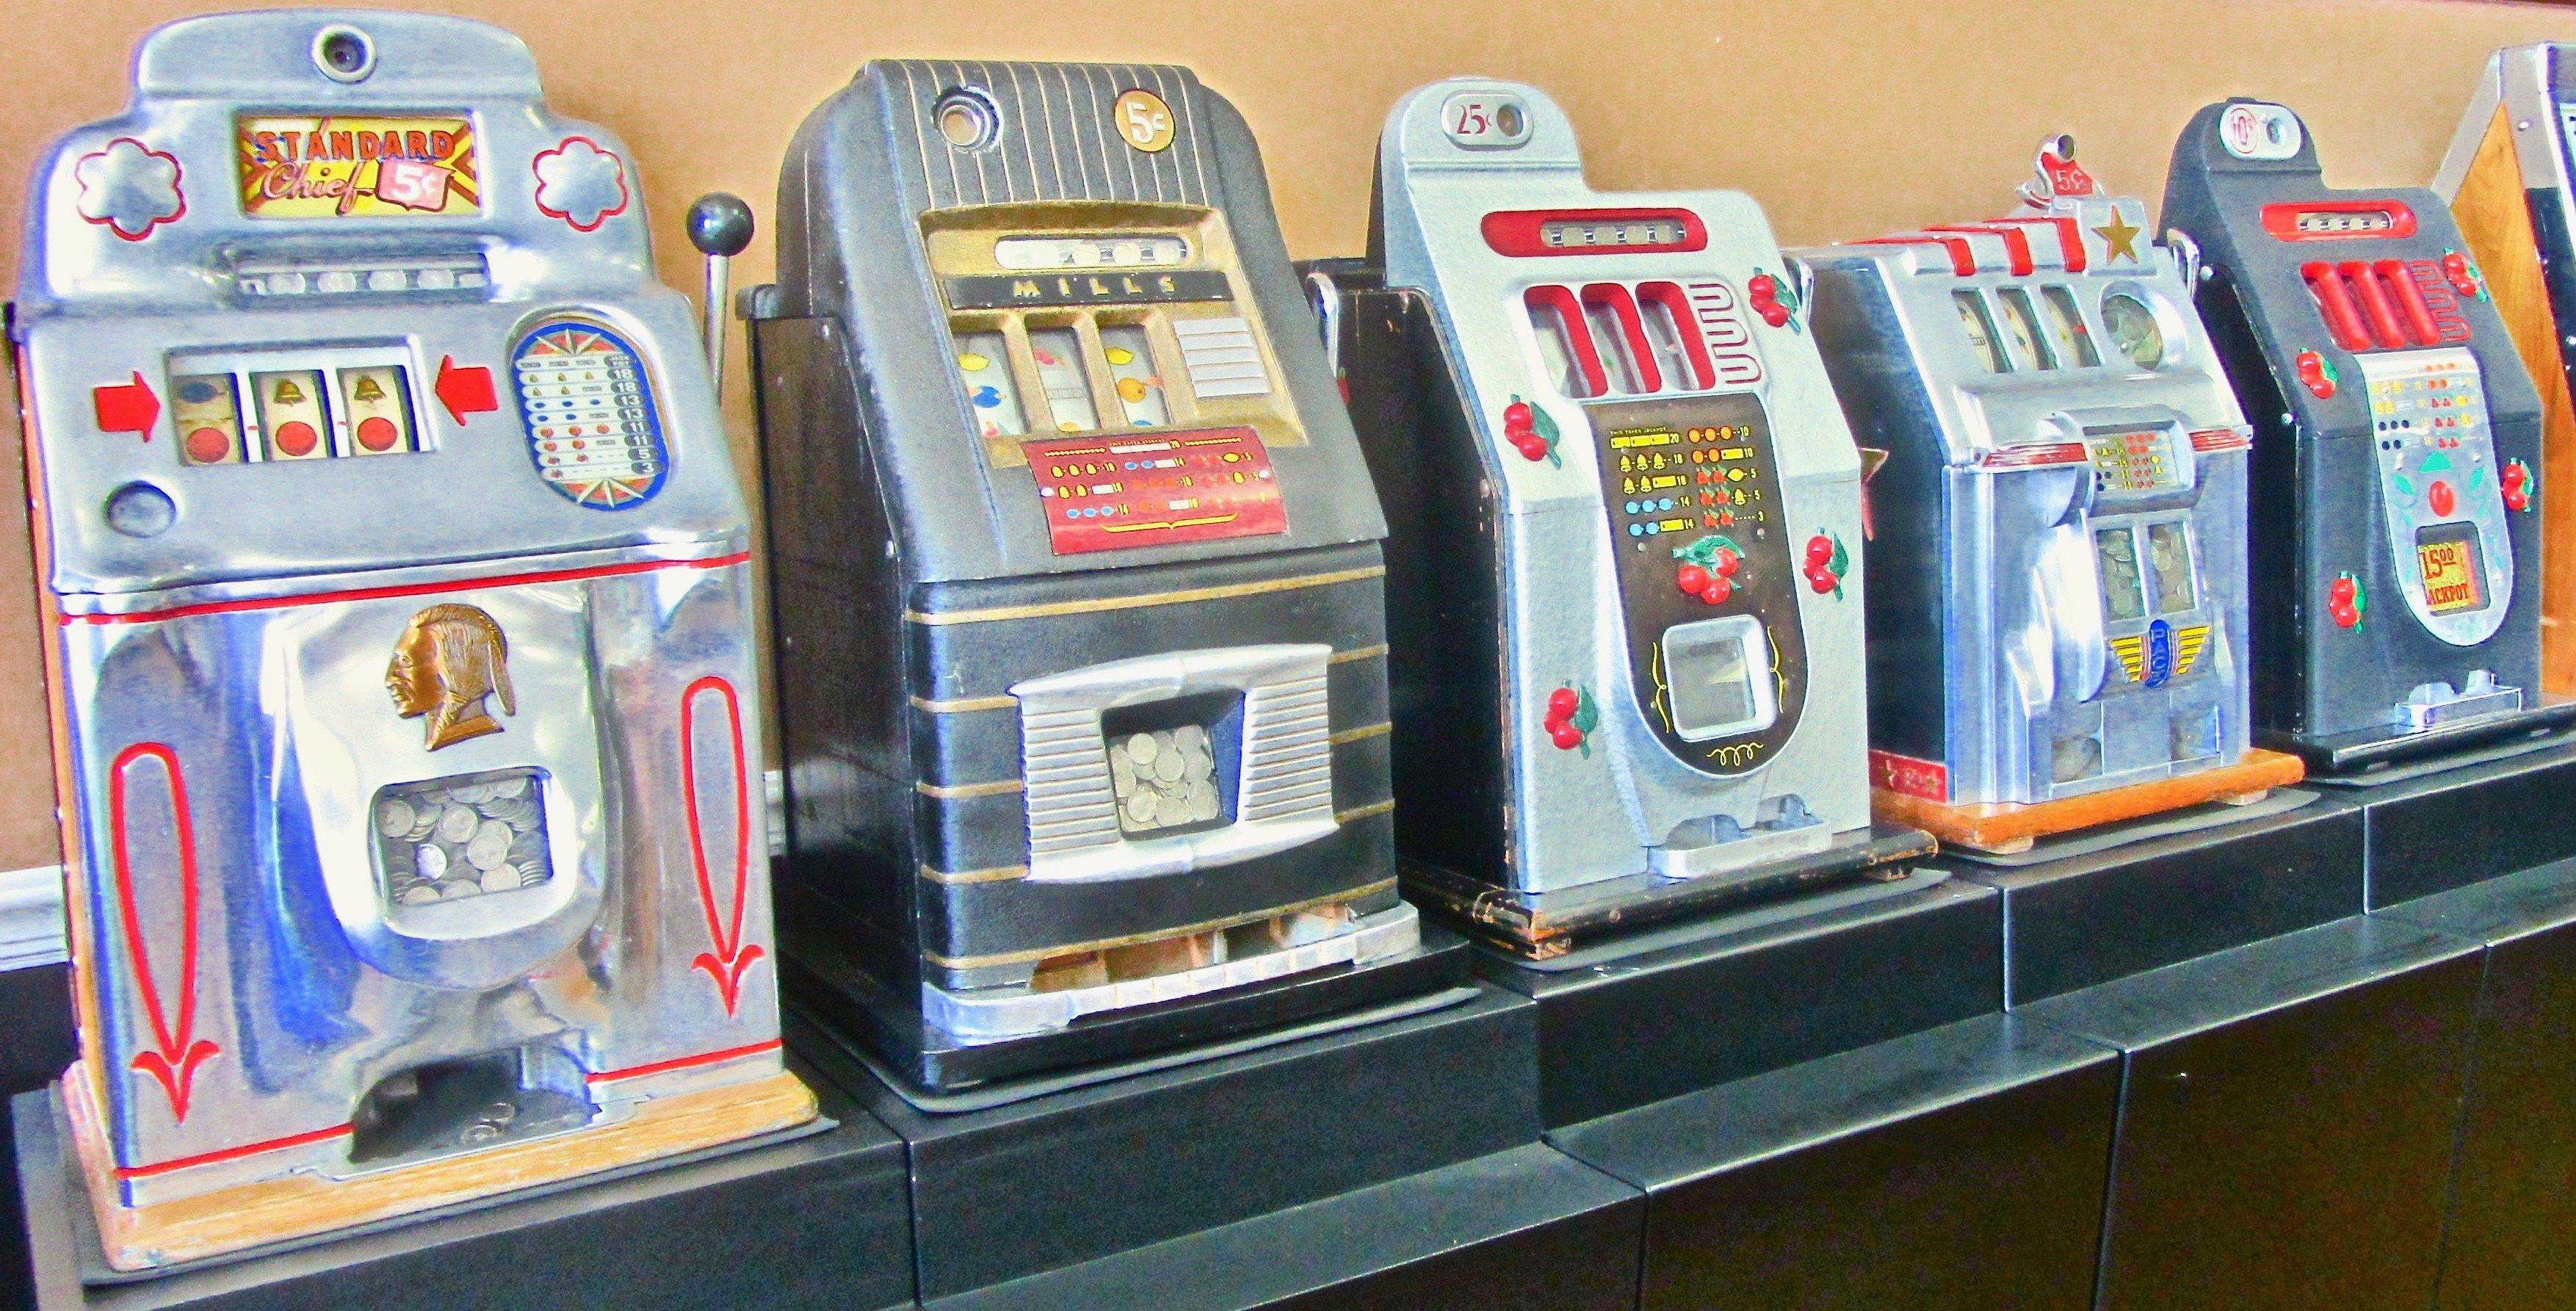 ARKANSAS SIGHTSEEING: Hot Springs' Gambling Museum a surefire winner